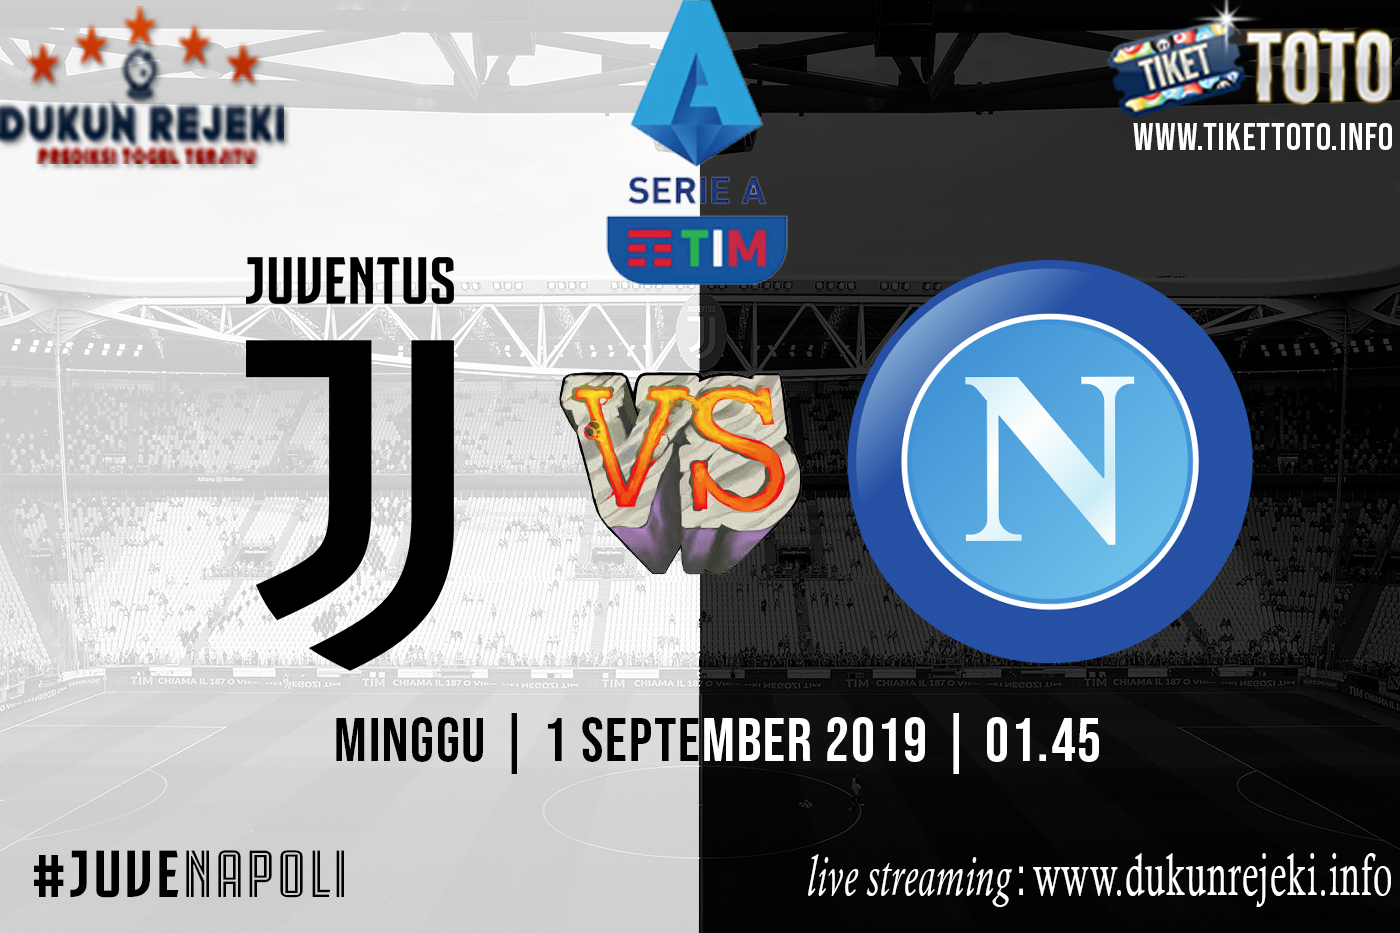 Prediksi Pertandingan Juventus Vs Napoli 1 September 2019